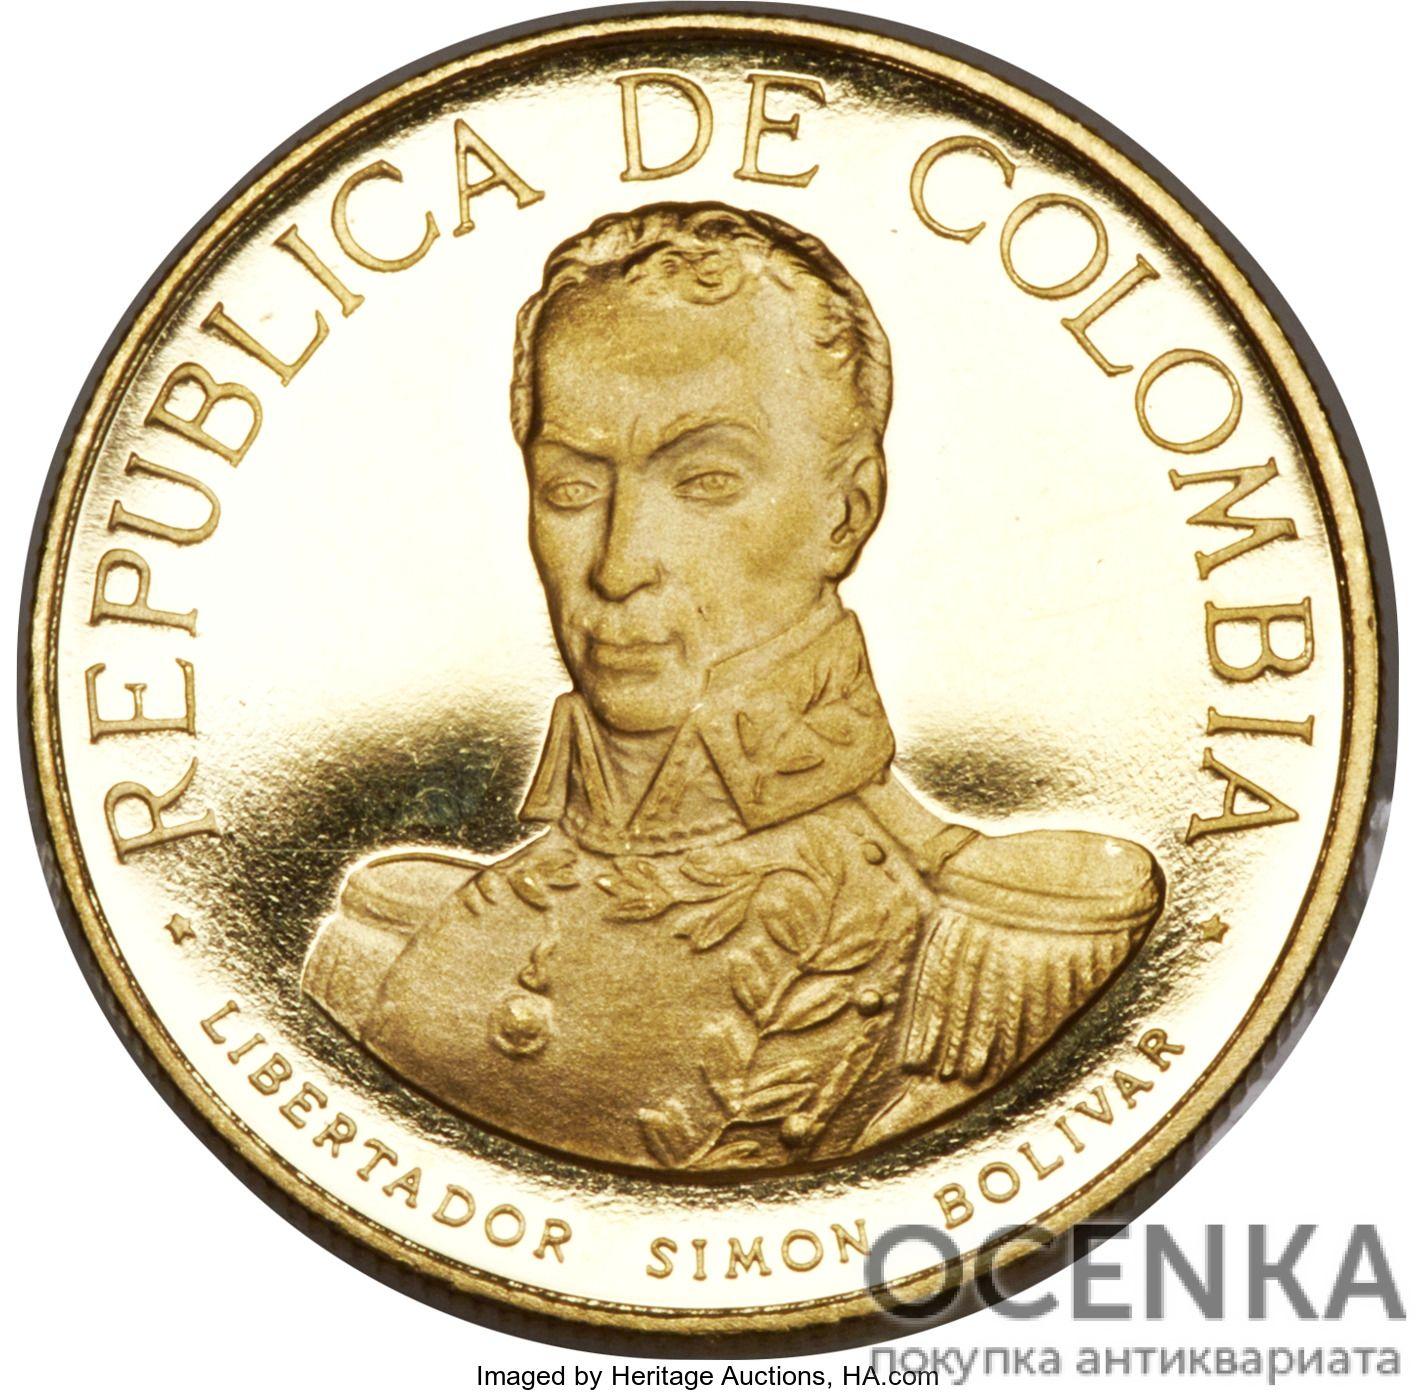 Золотая монета 200 Песо (200 Pesos) Колумбия - 3